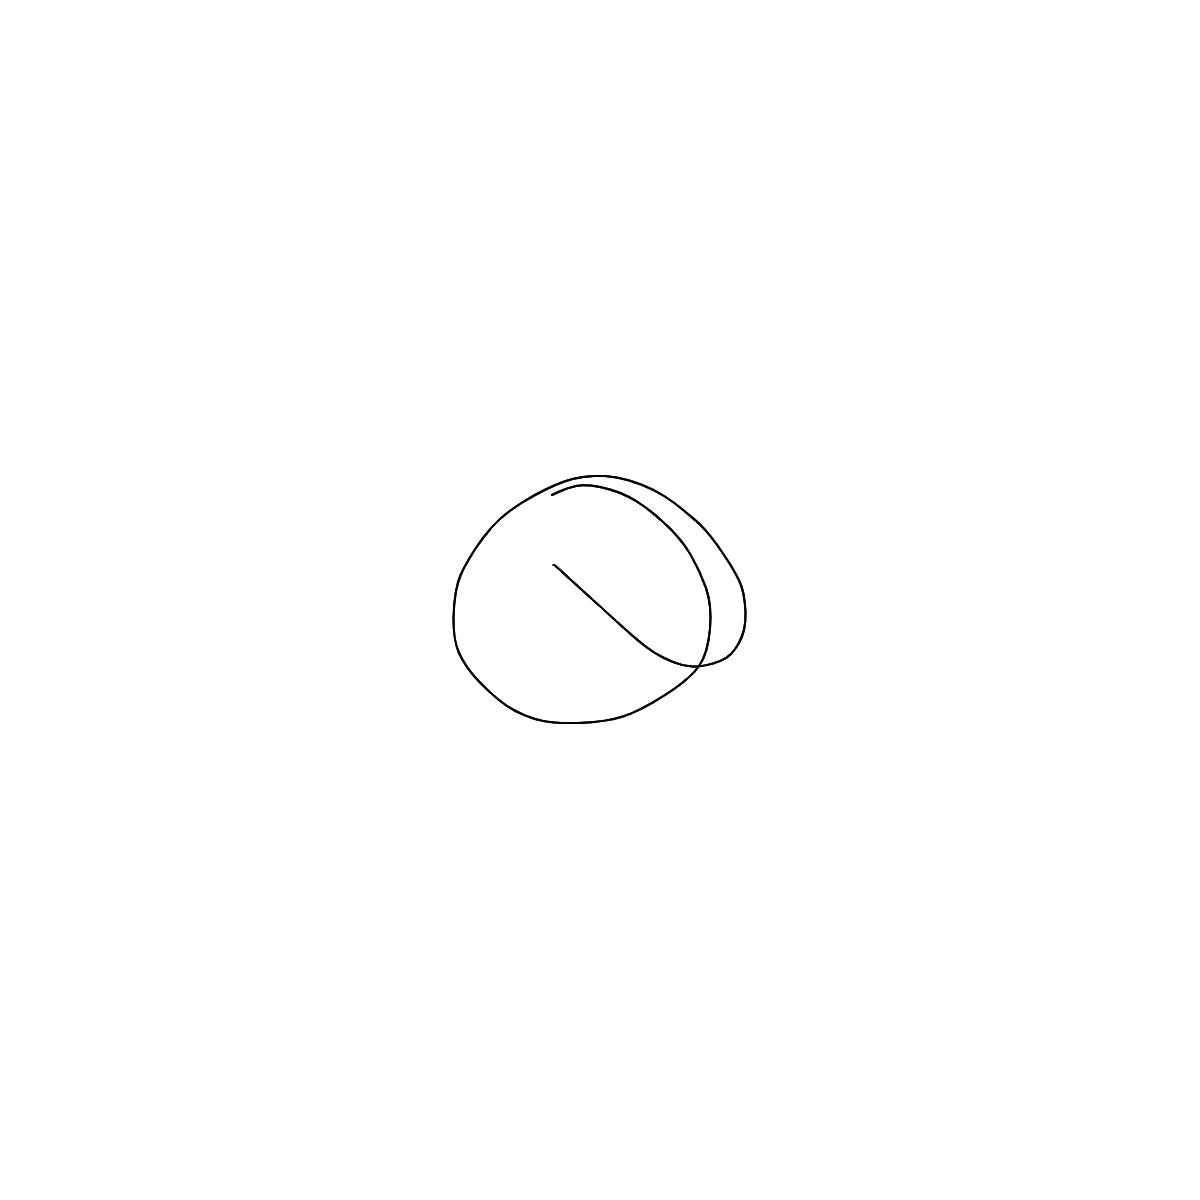 BAAAM drawing#24289 lat:47.0102233886718750lng: -0.1098541691899300